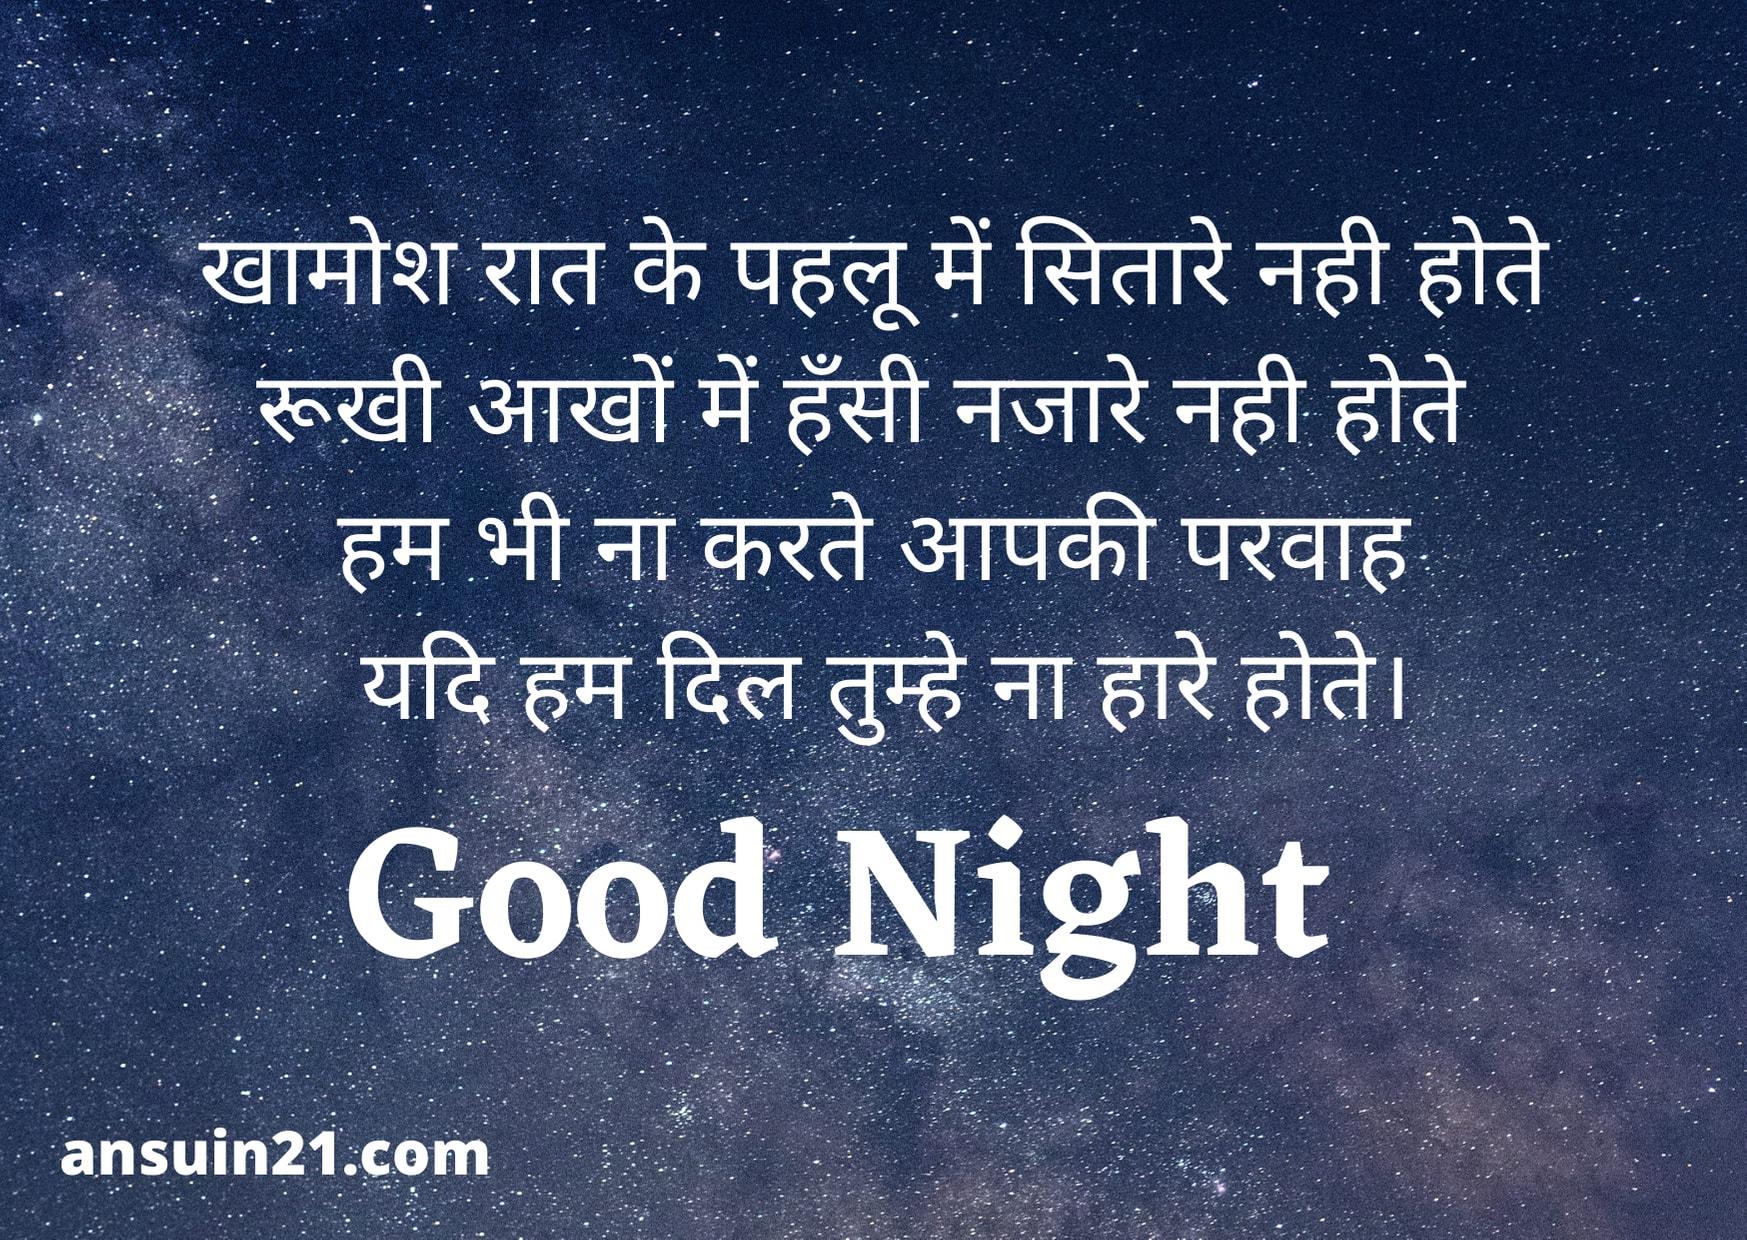 Best Good Night Hindi Wishes, Images, Status, SMS, Shayari